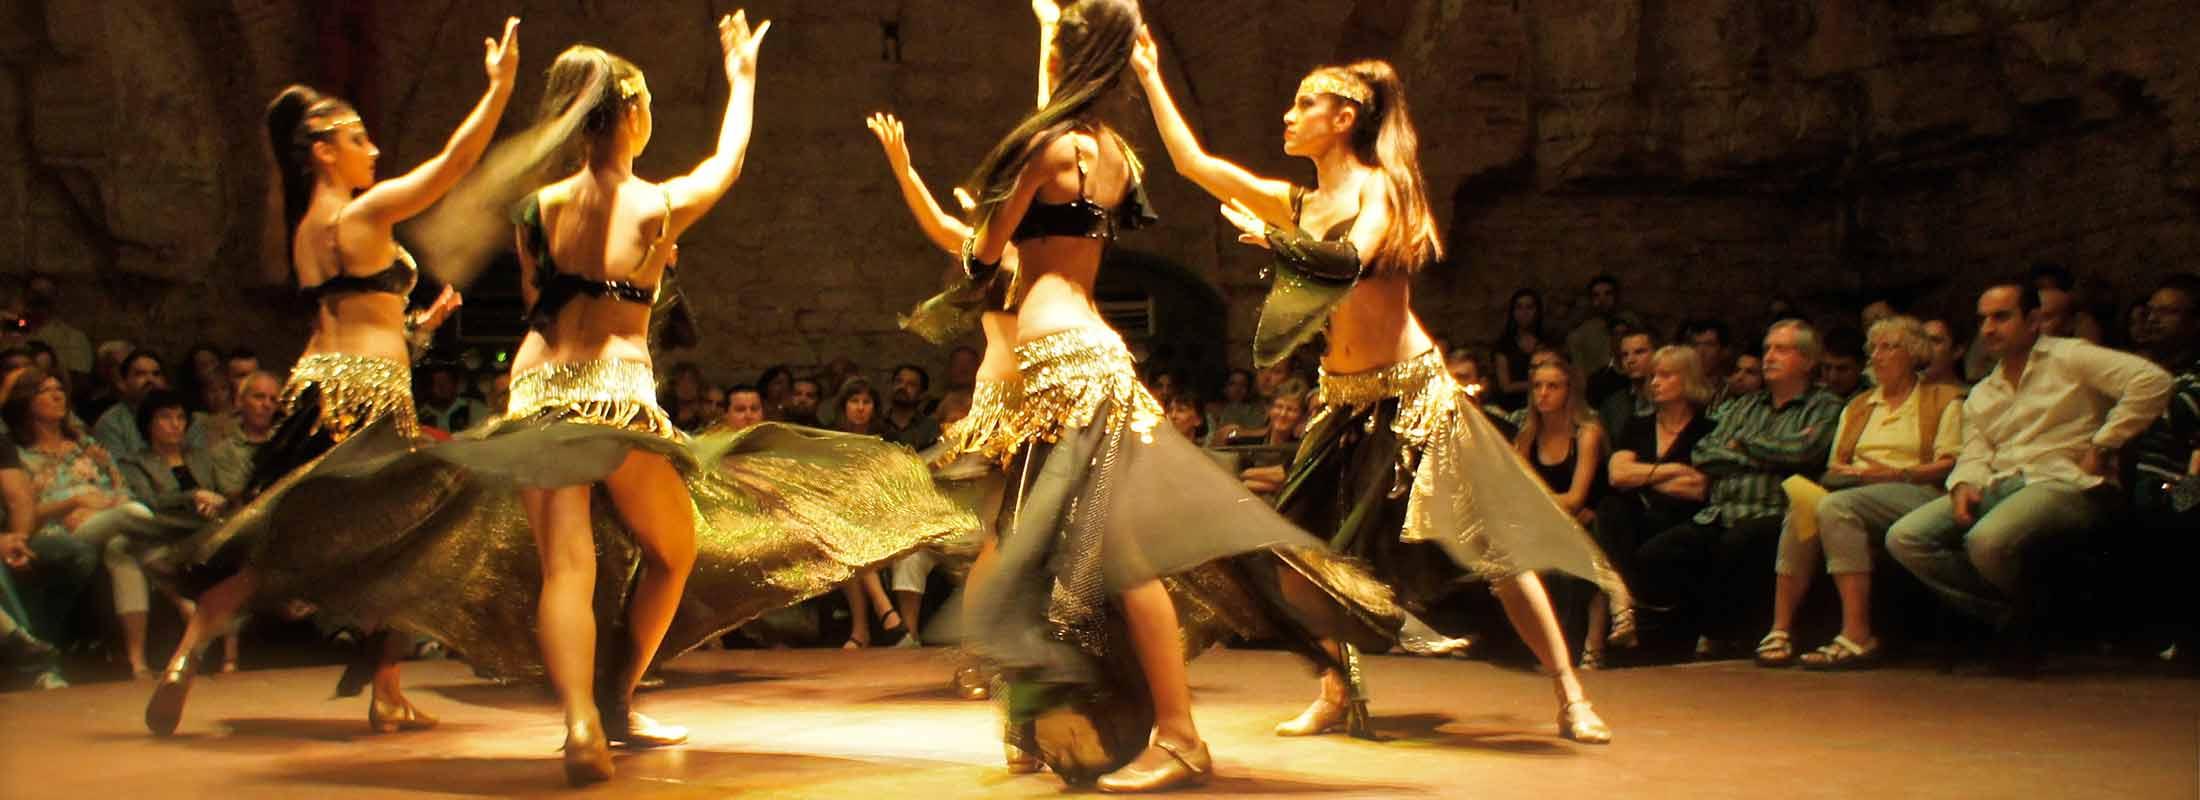 Istanbul Turkish Dance Show Modern Folklore